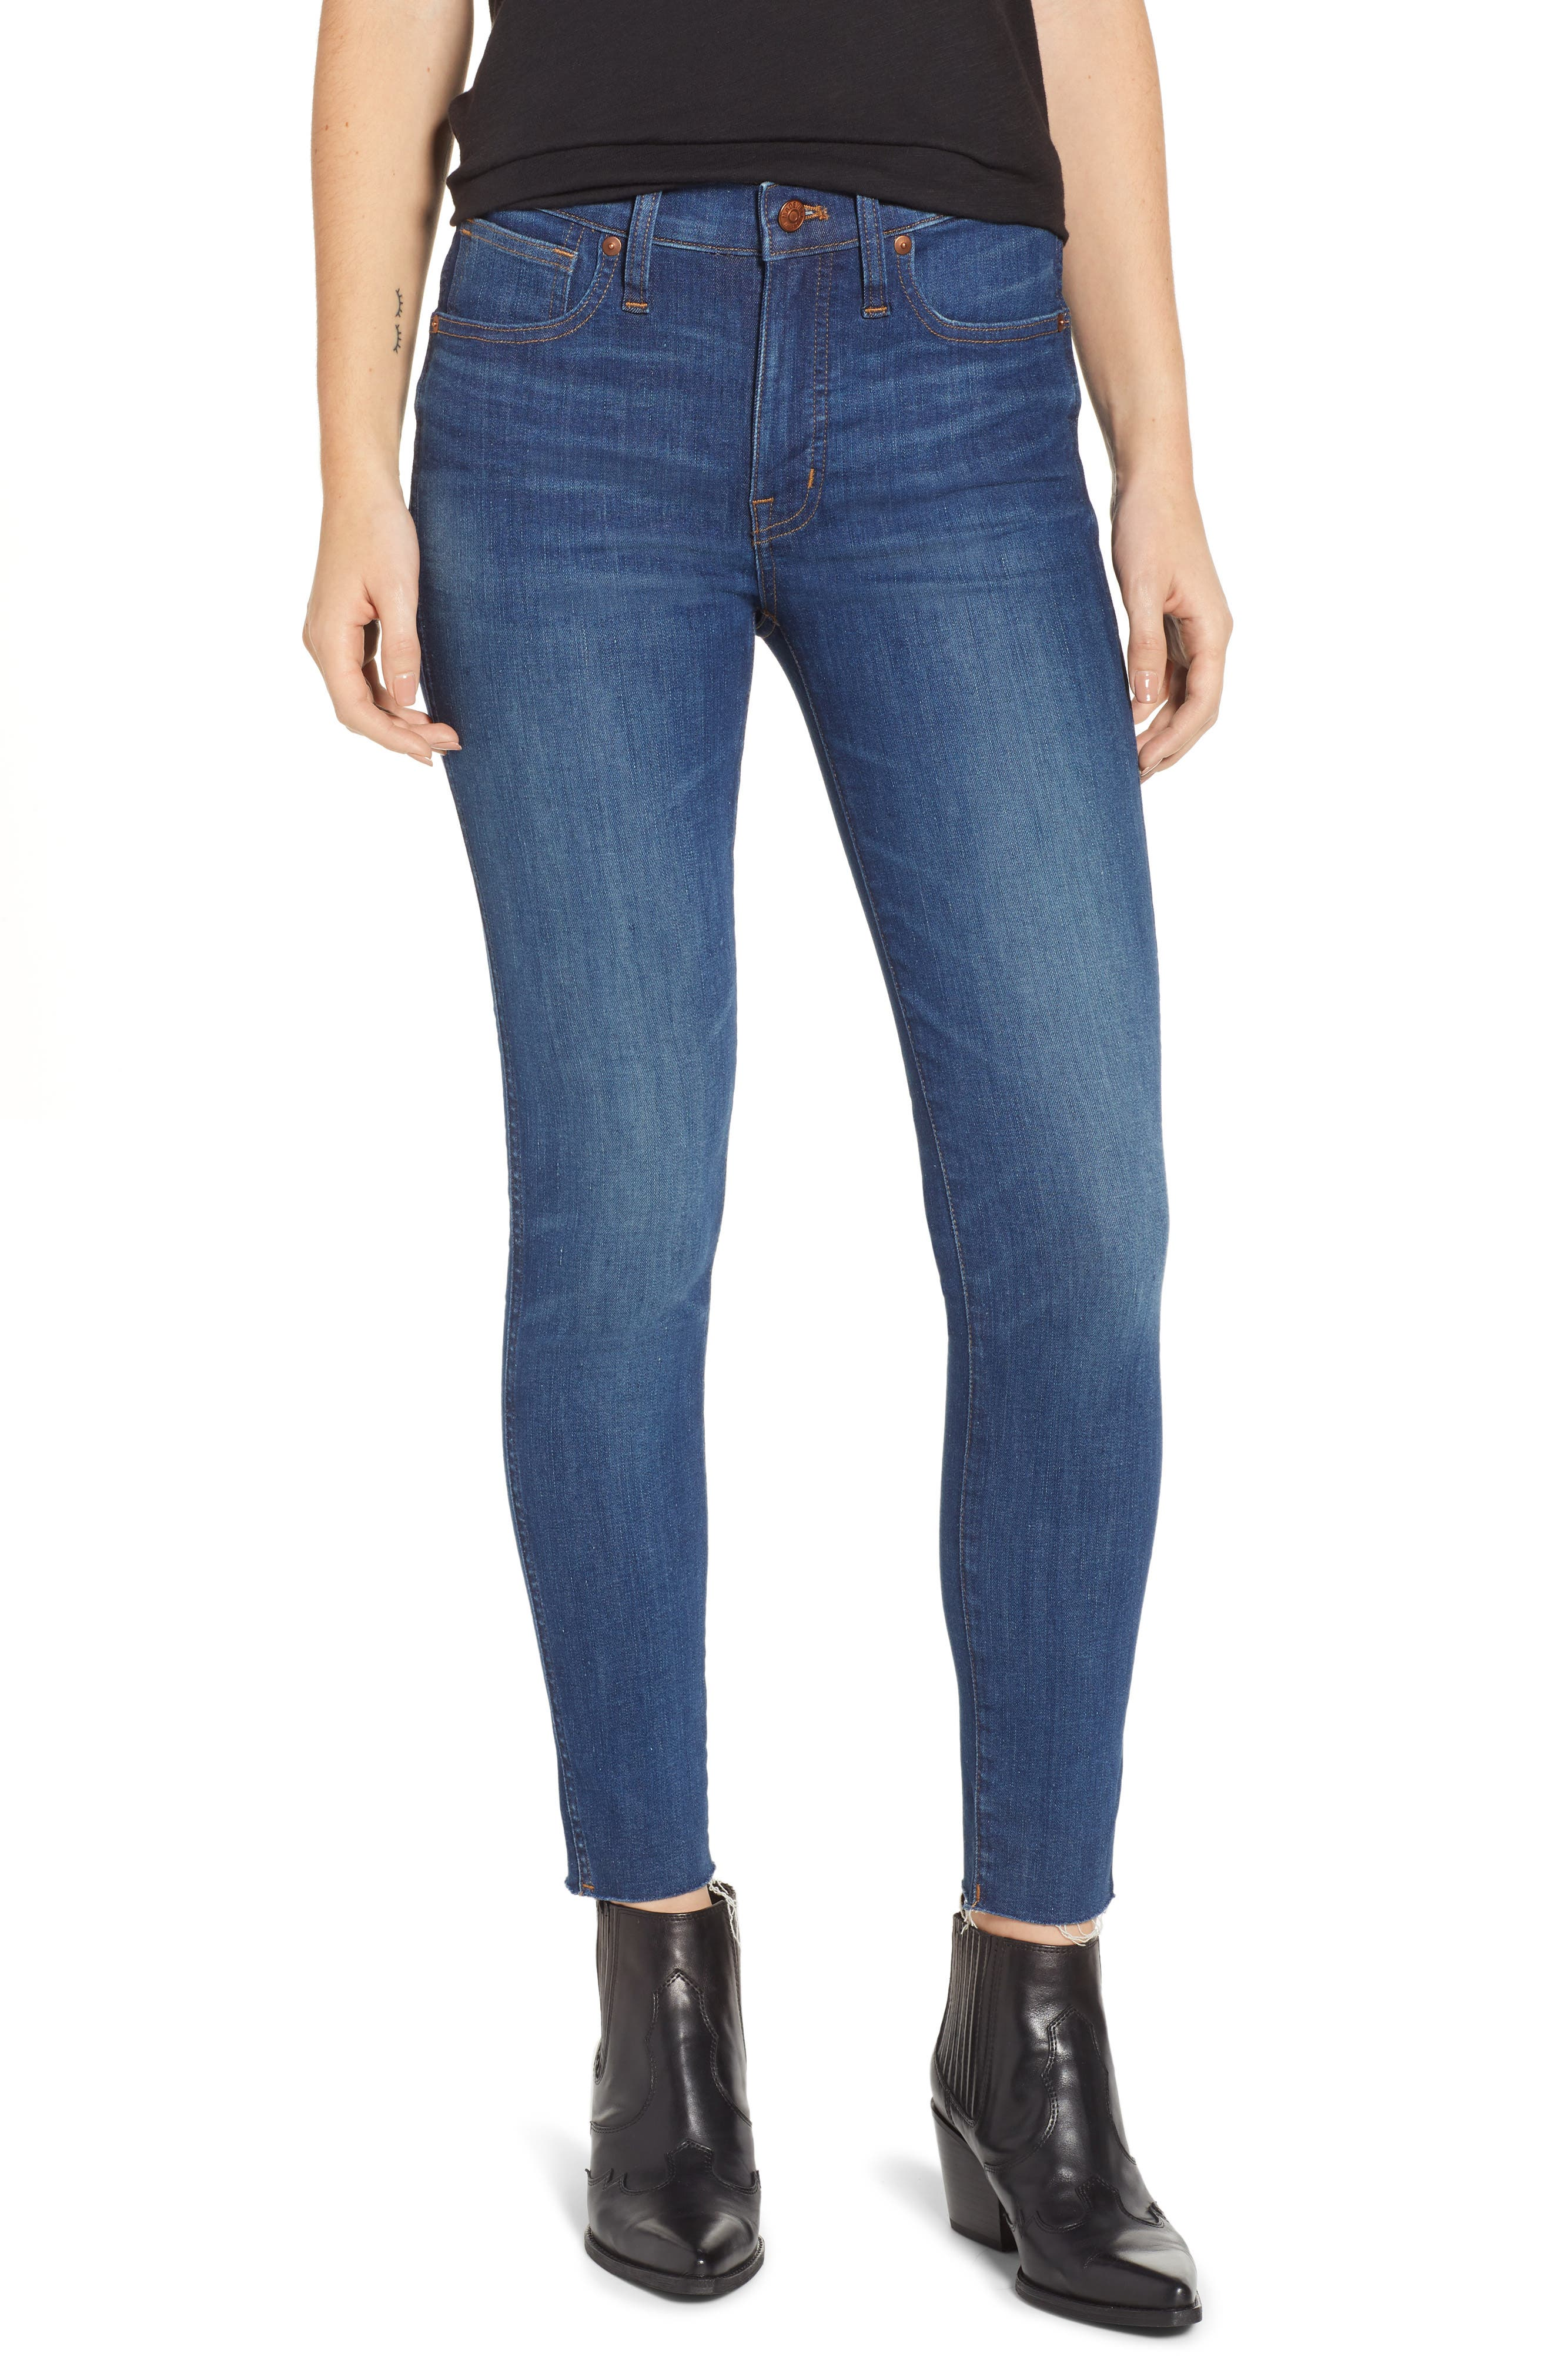 MADEWELL 9-Inch Skinny Jeans Raw Hem Edition, Main, color, PALOMA